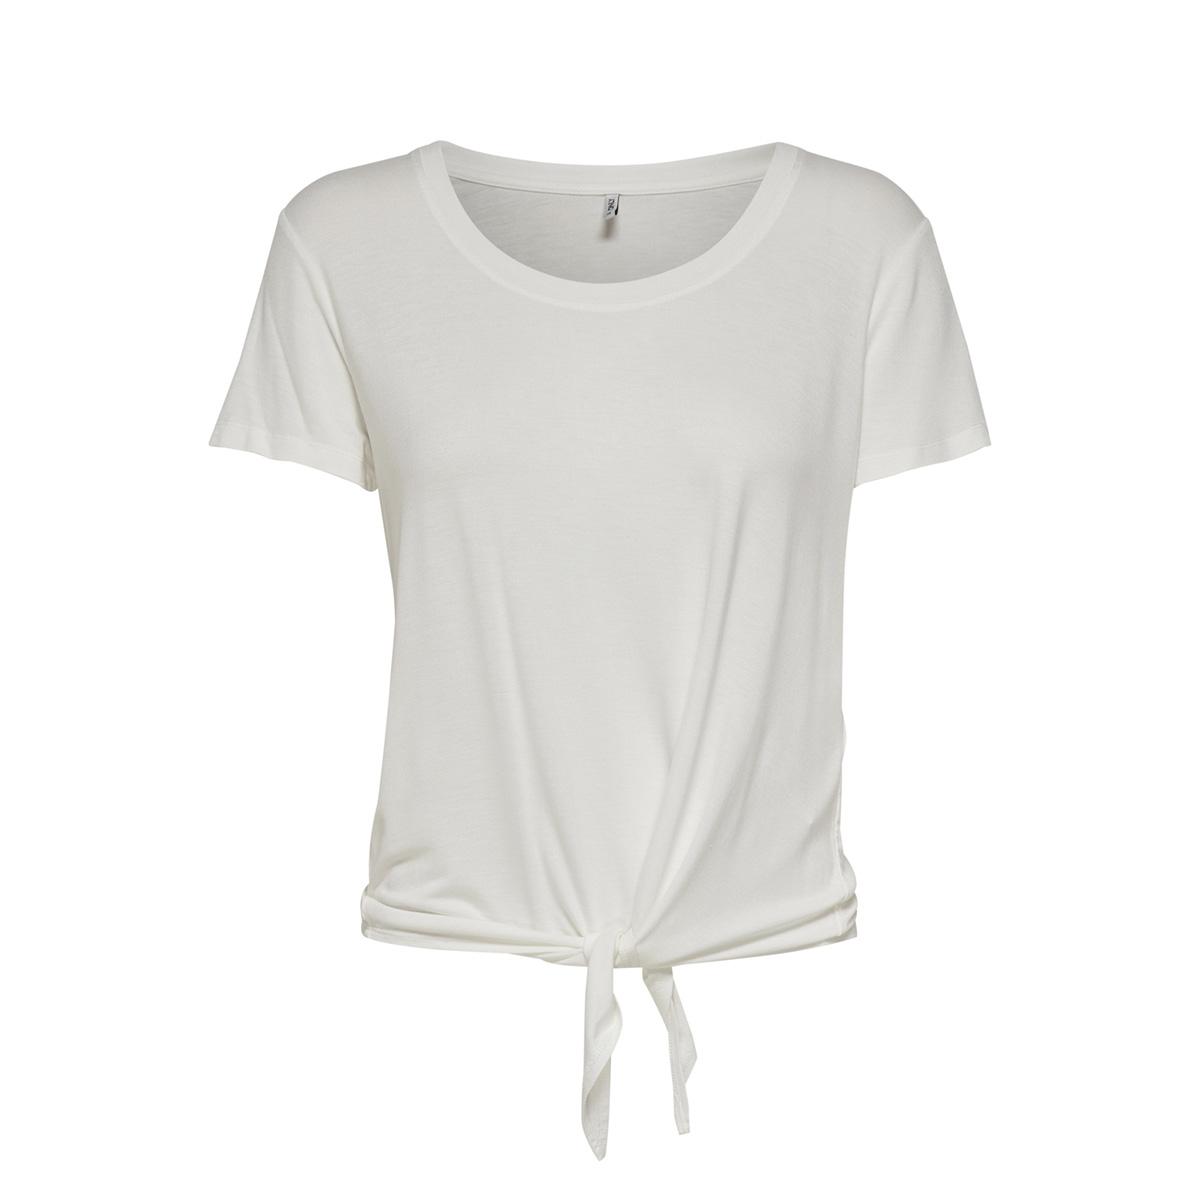 onlarli s/s knot top jrs noos 15178088 only t-shirt cloud dancer